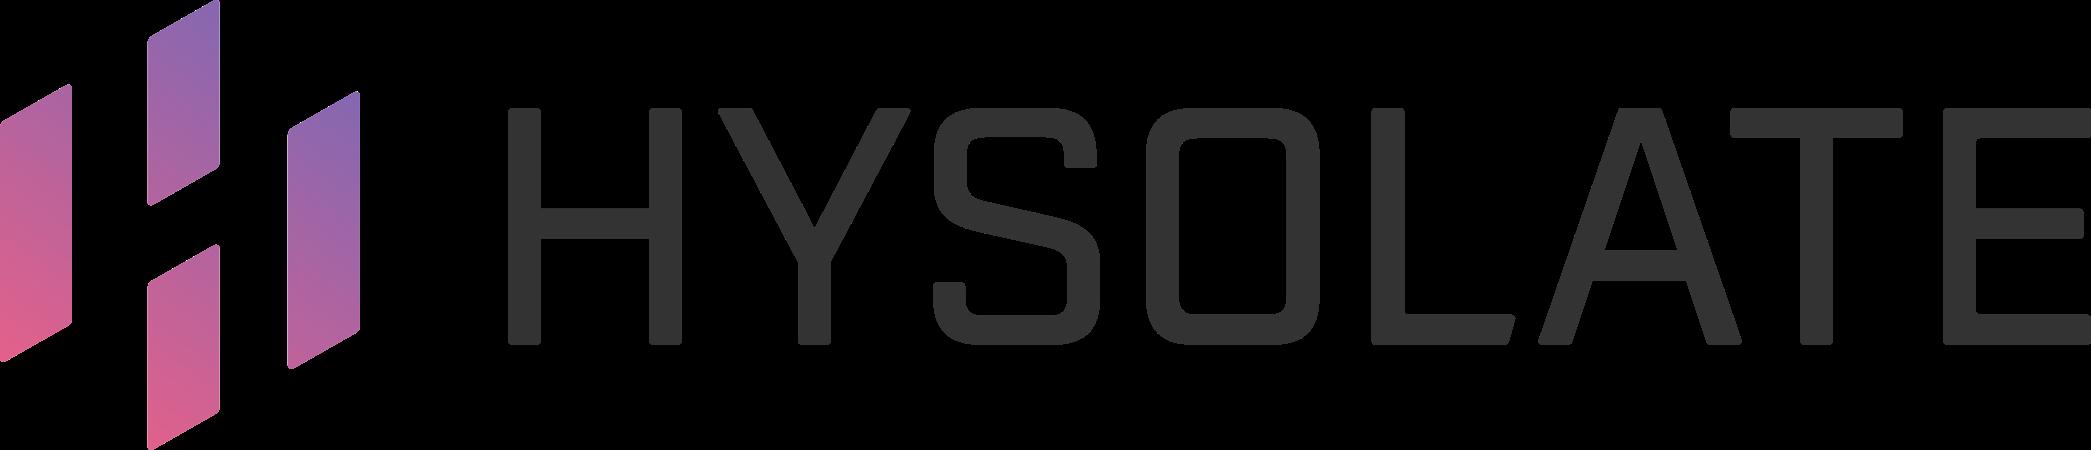 Hysolate